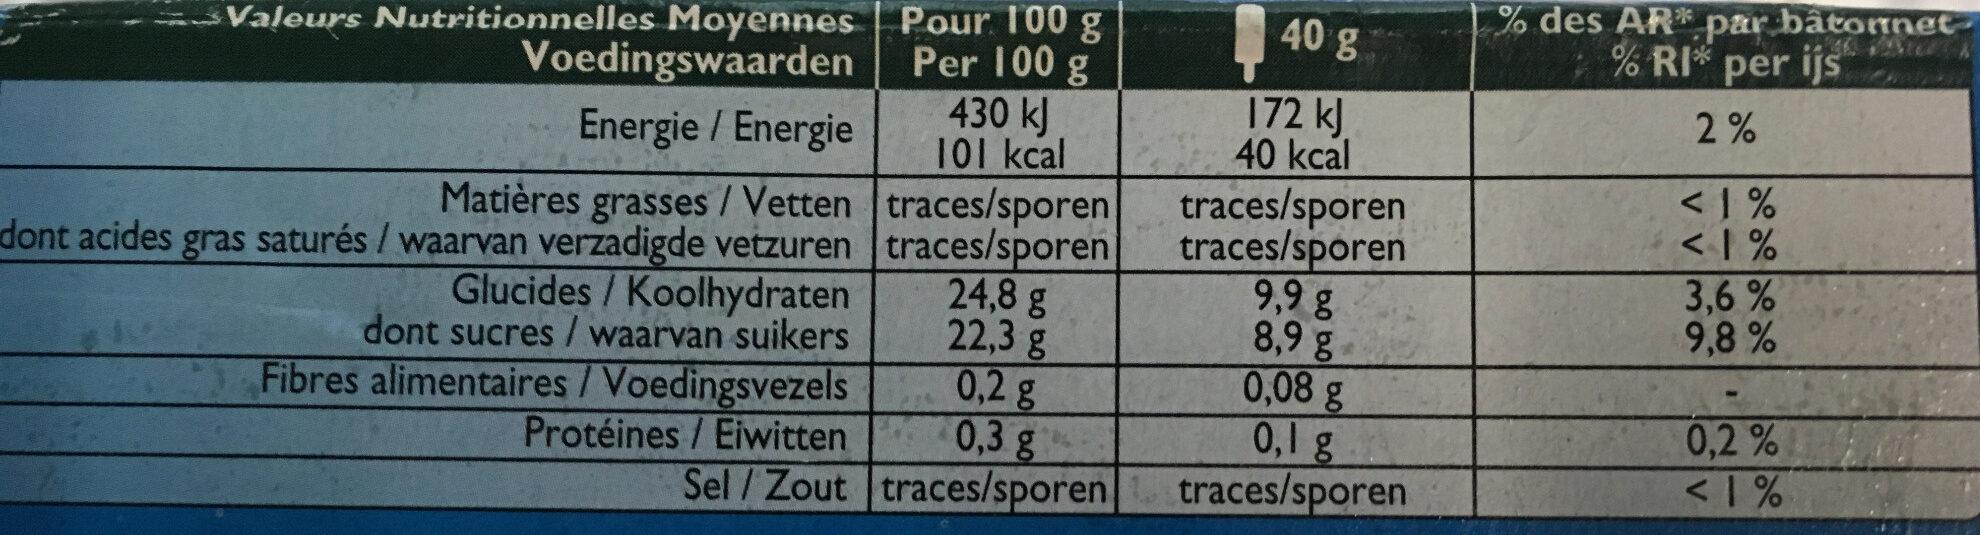 Sorbet Oasis Pêche Pomme Framboise - Nutrition facts - fr